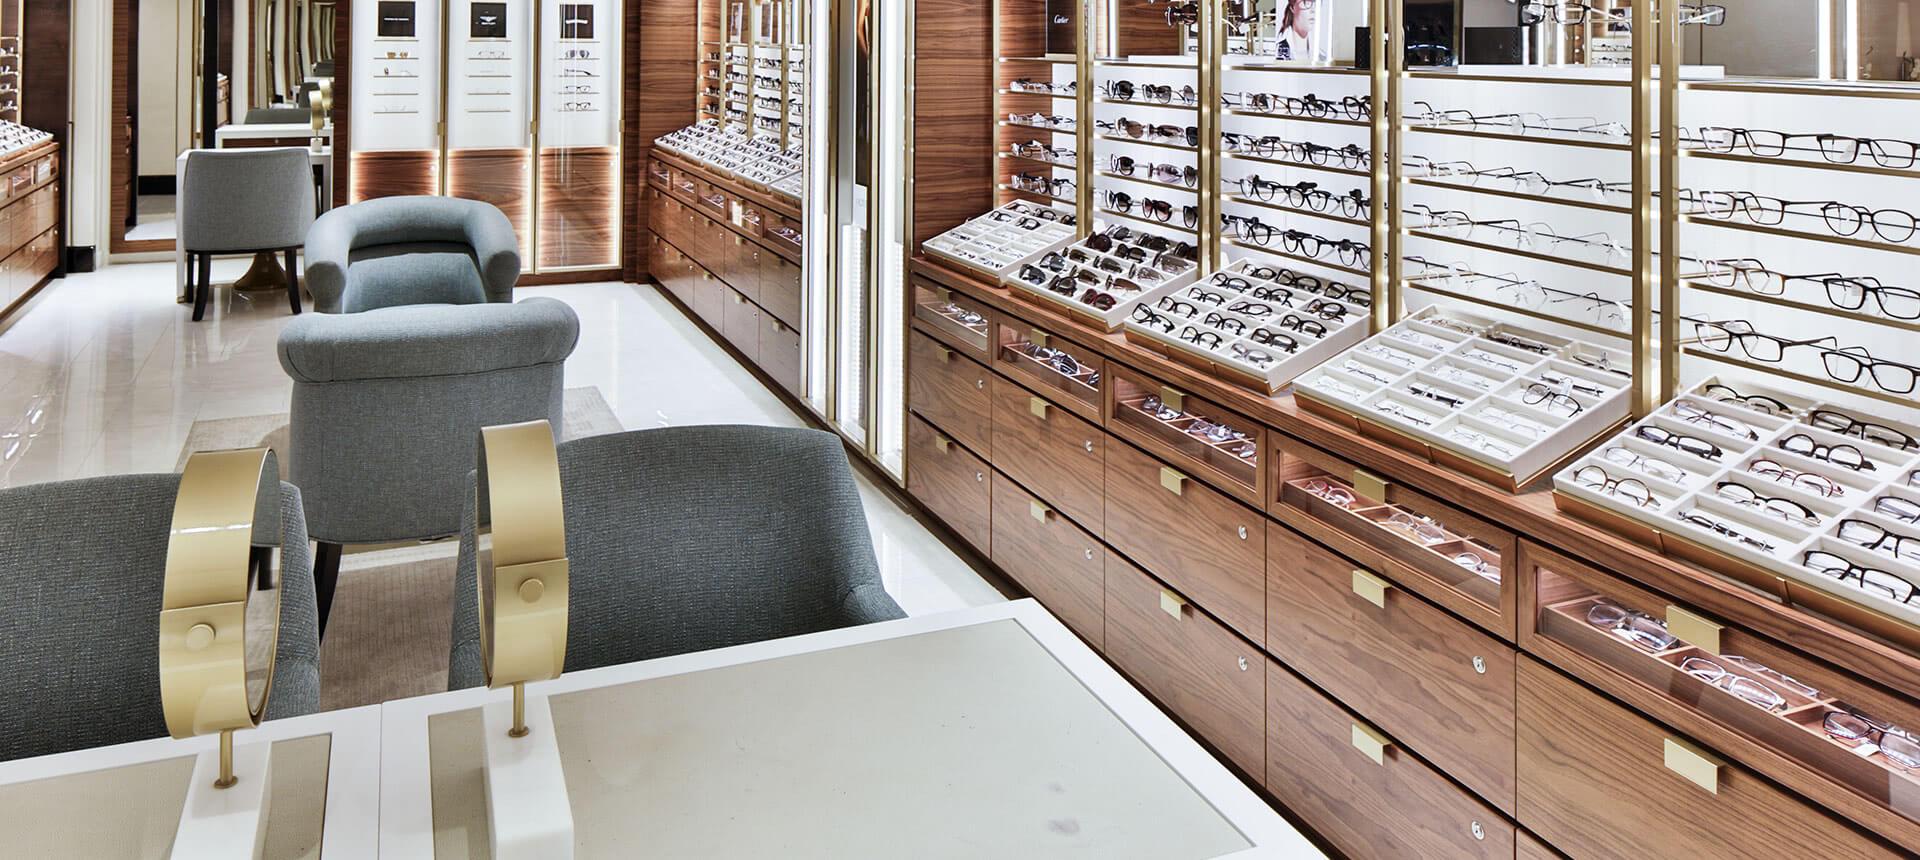 Harrods Opticians Intimate setting for luxury Harrods